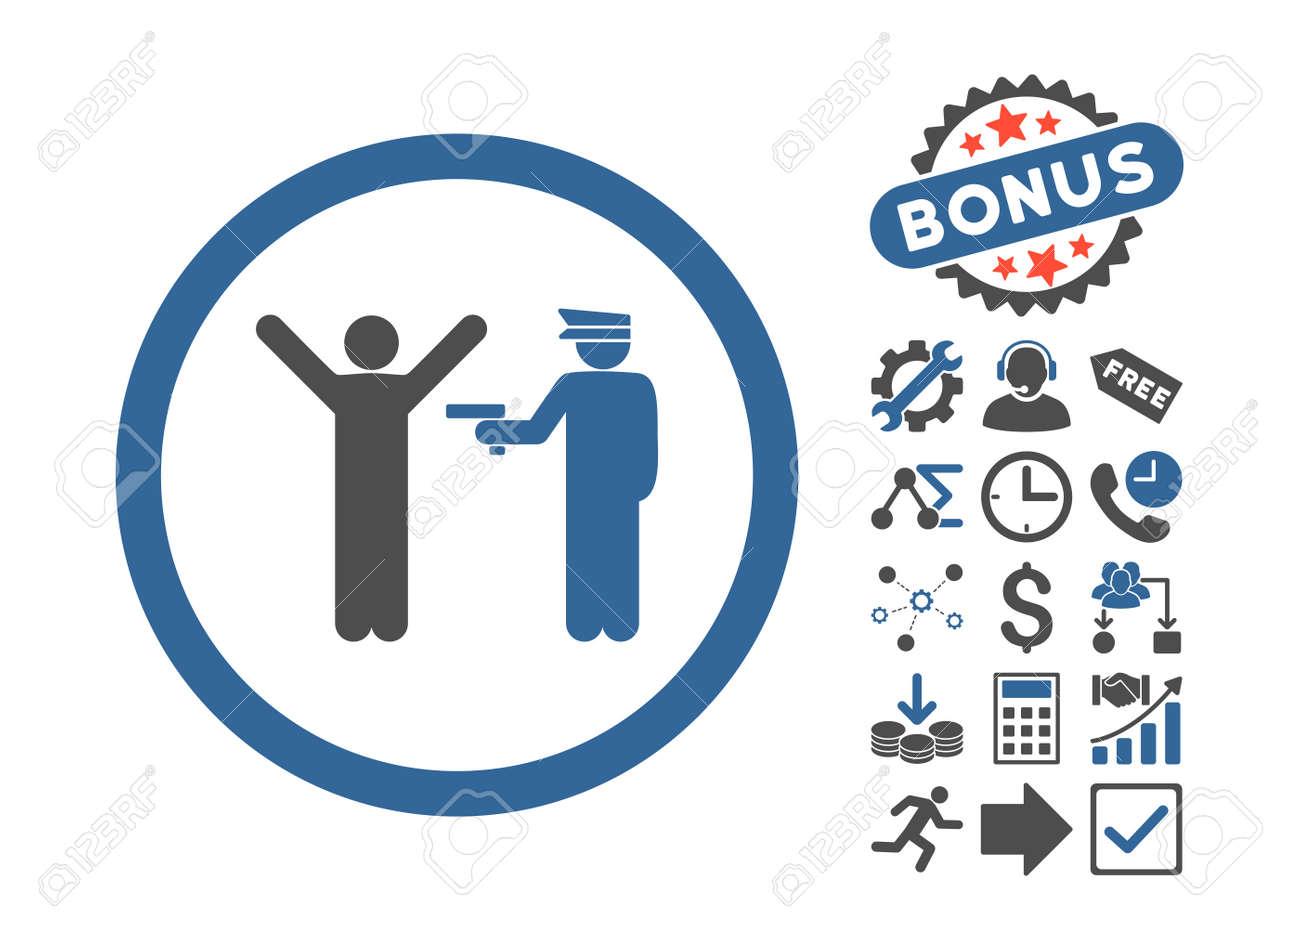 Police Arrest Icon With Bonus Pictogram Glyph Illustration Style